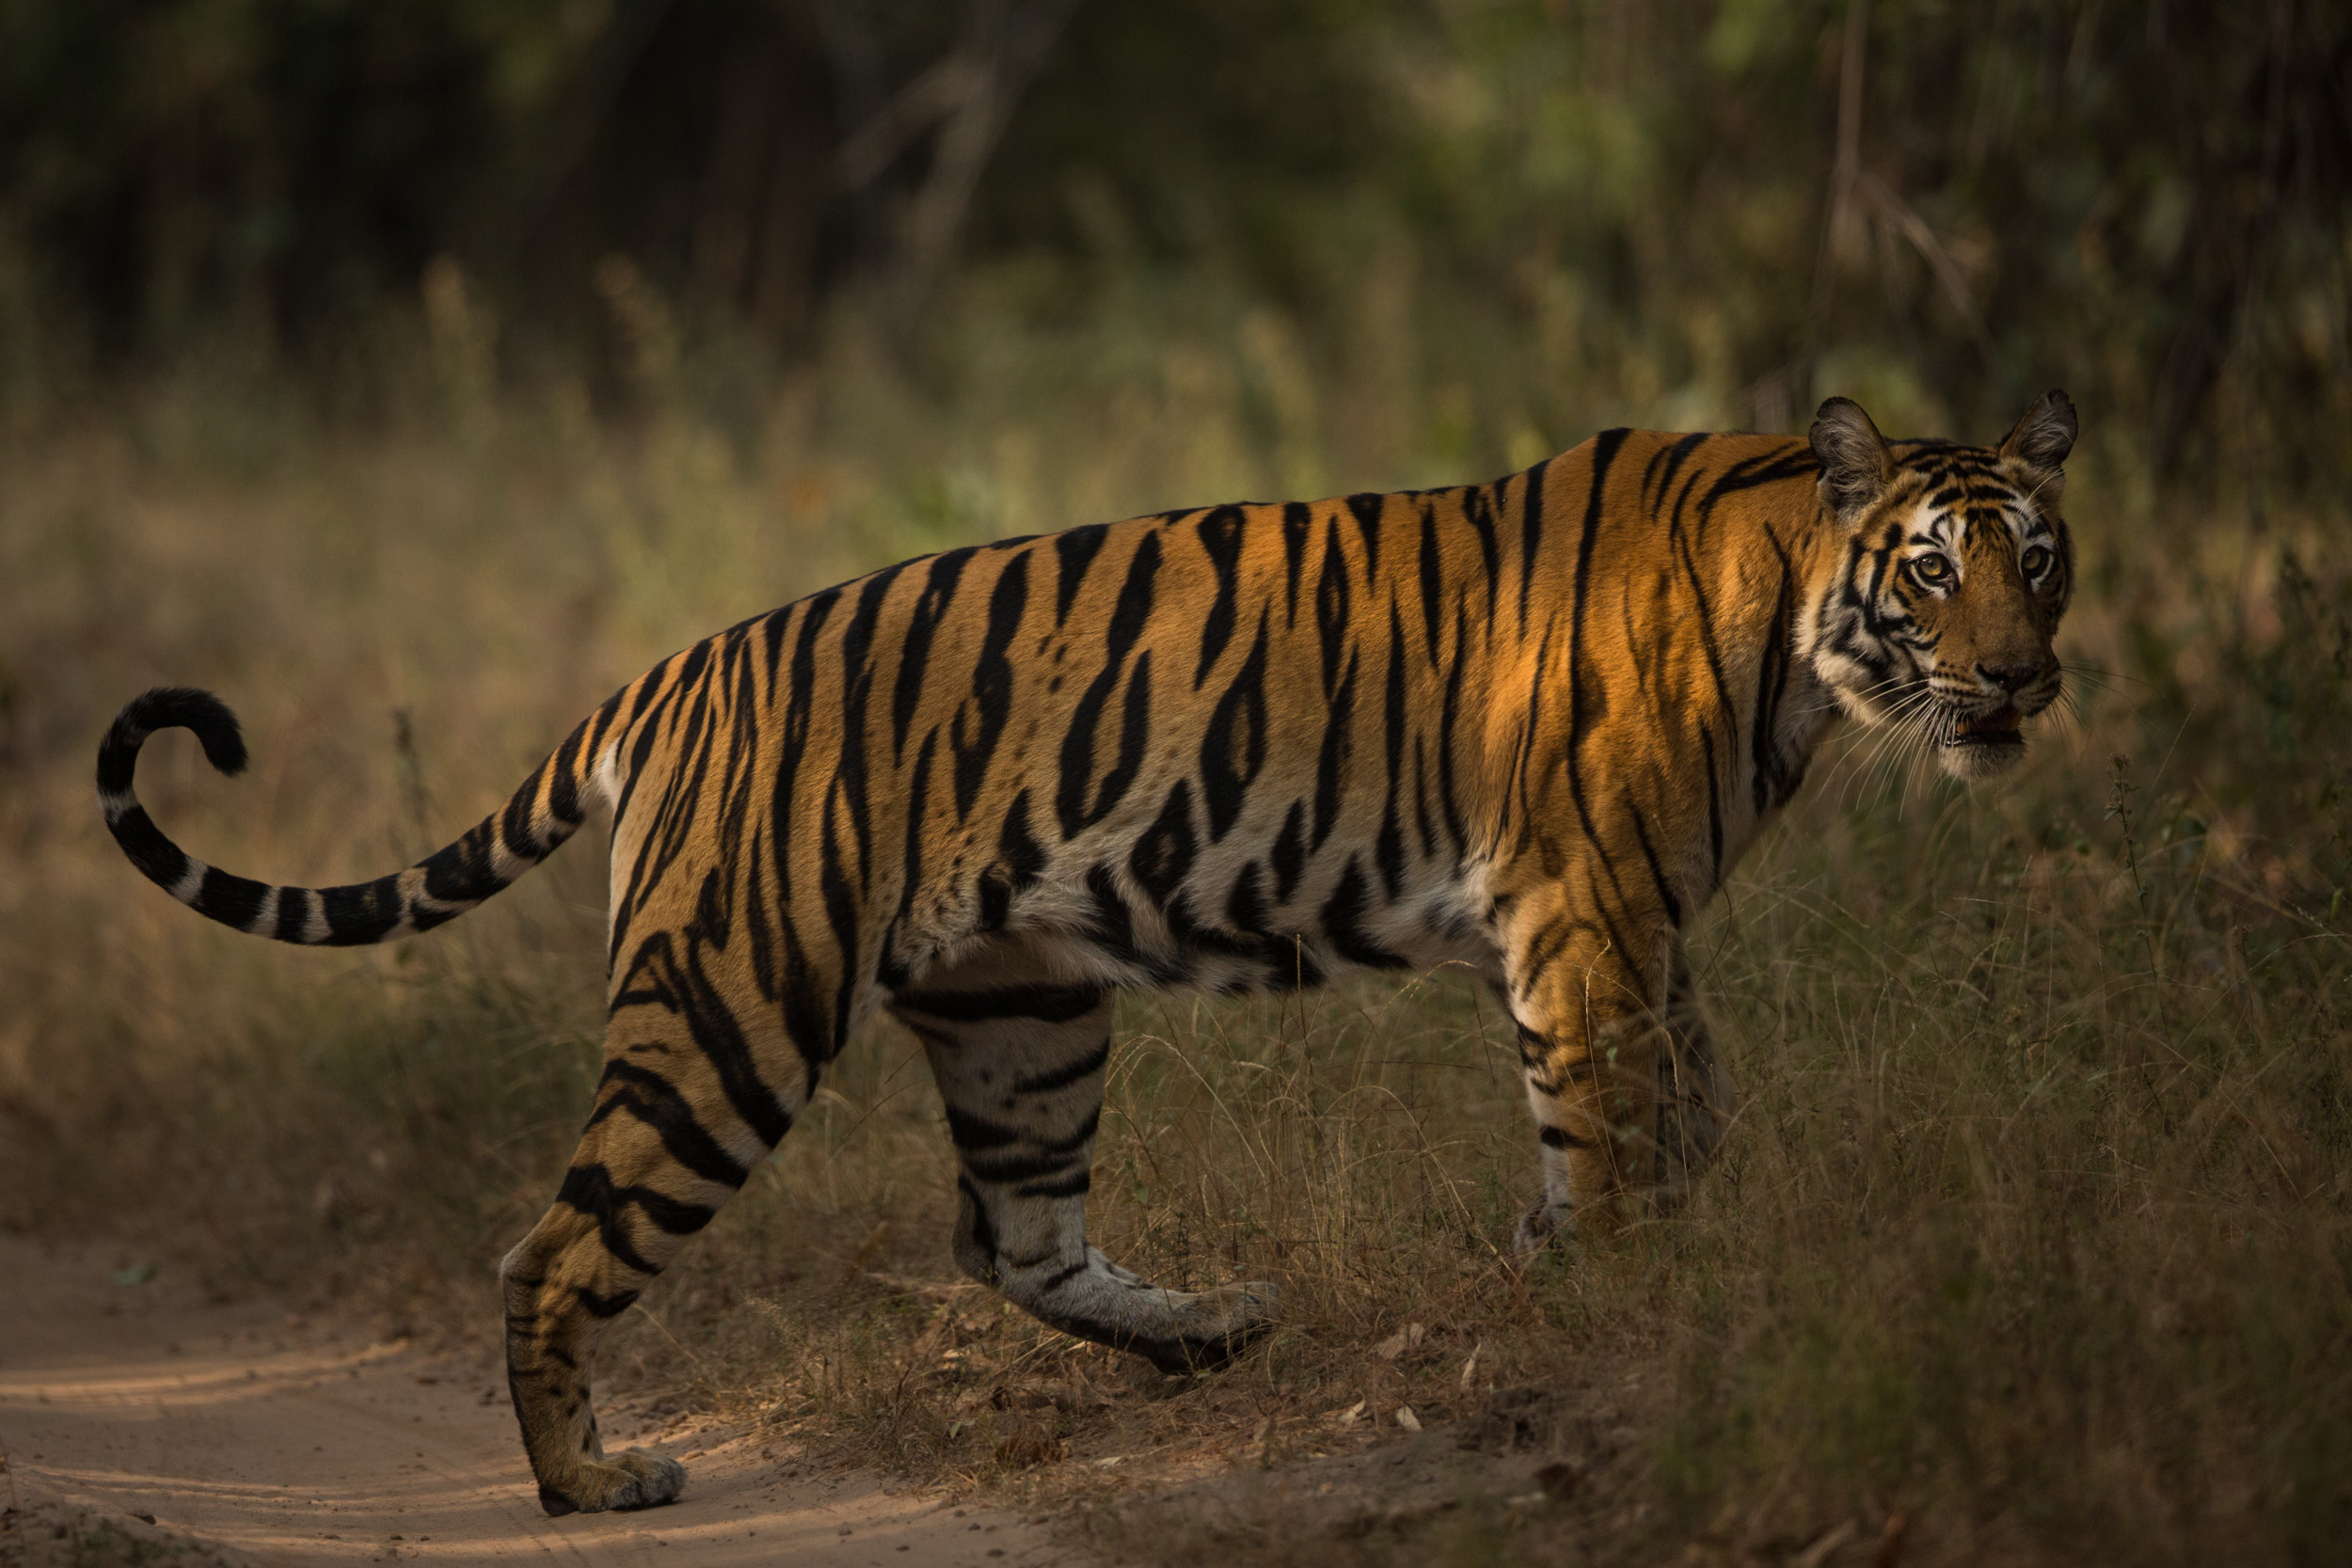 Tigeress (Panthera tigris) crossing.   CLICK IMAGE for full screen.